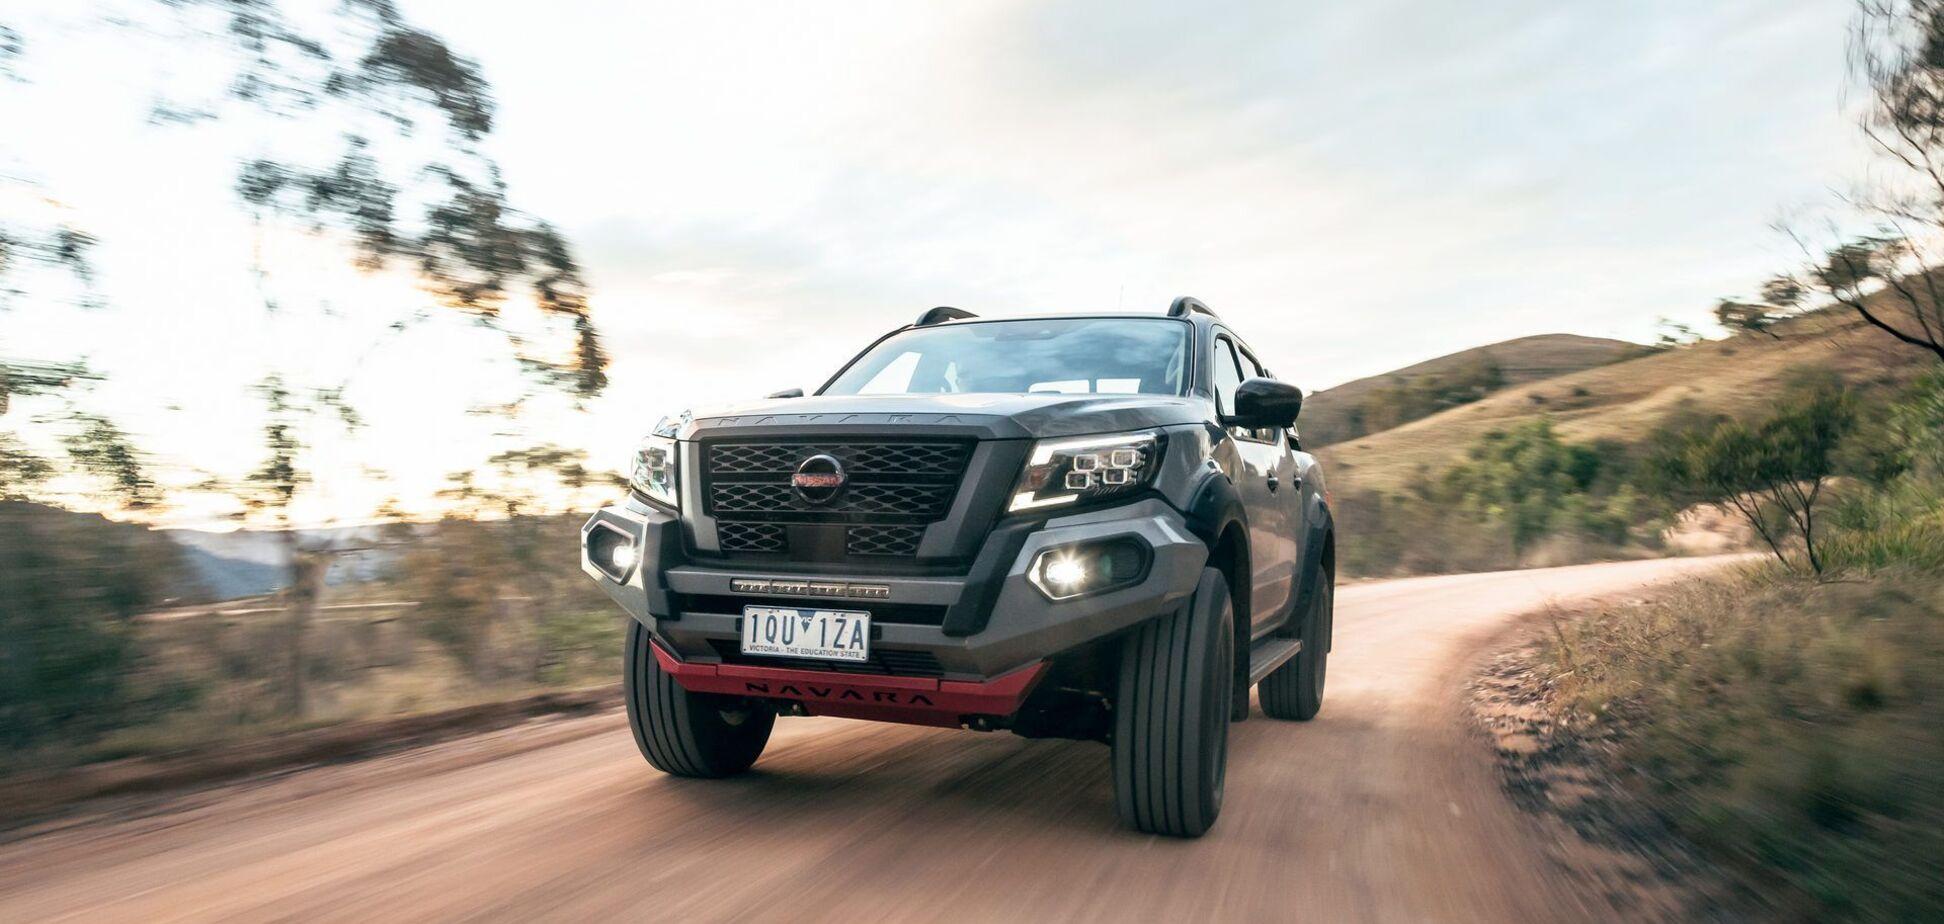 Nissan показал 'прокачанную' версию пикапа Navara